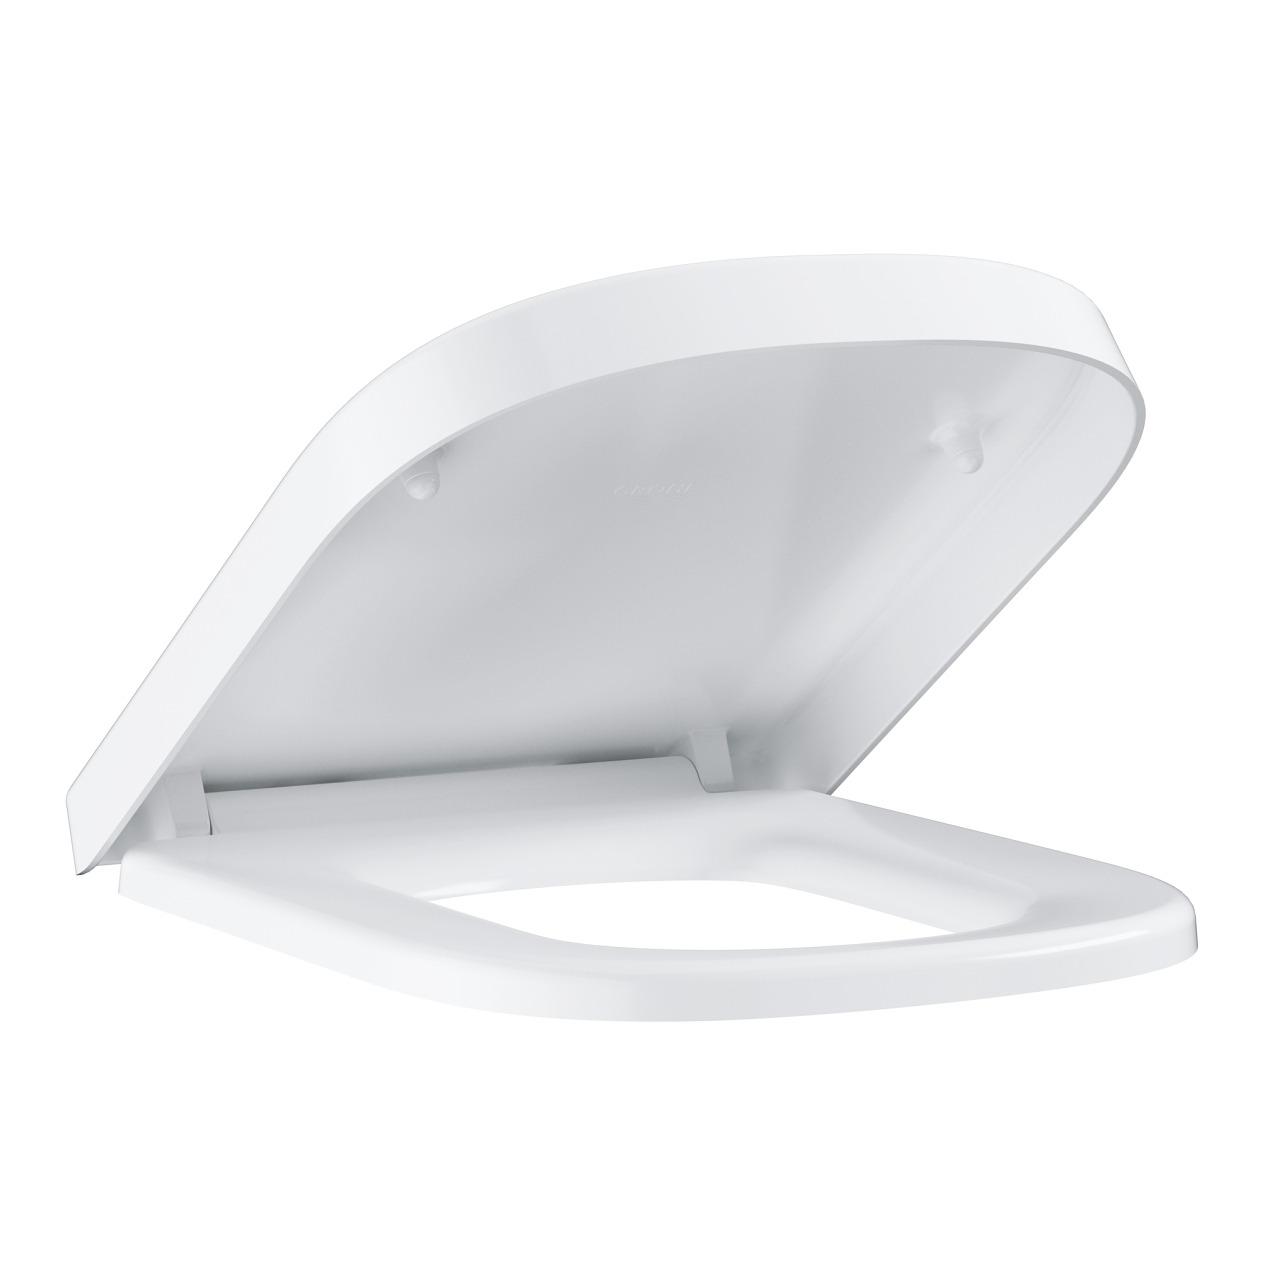 GROHE 39208000 Bidet Suspendu Euro Ceramic Blanc Alpin